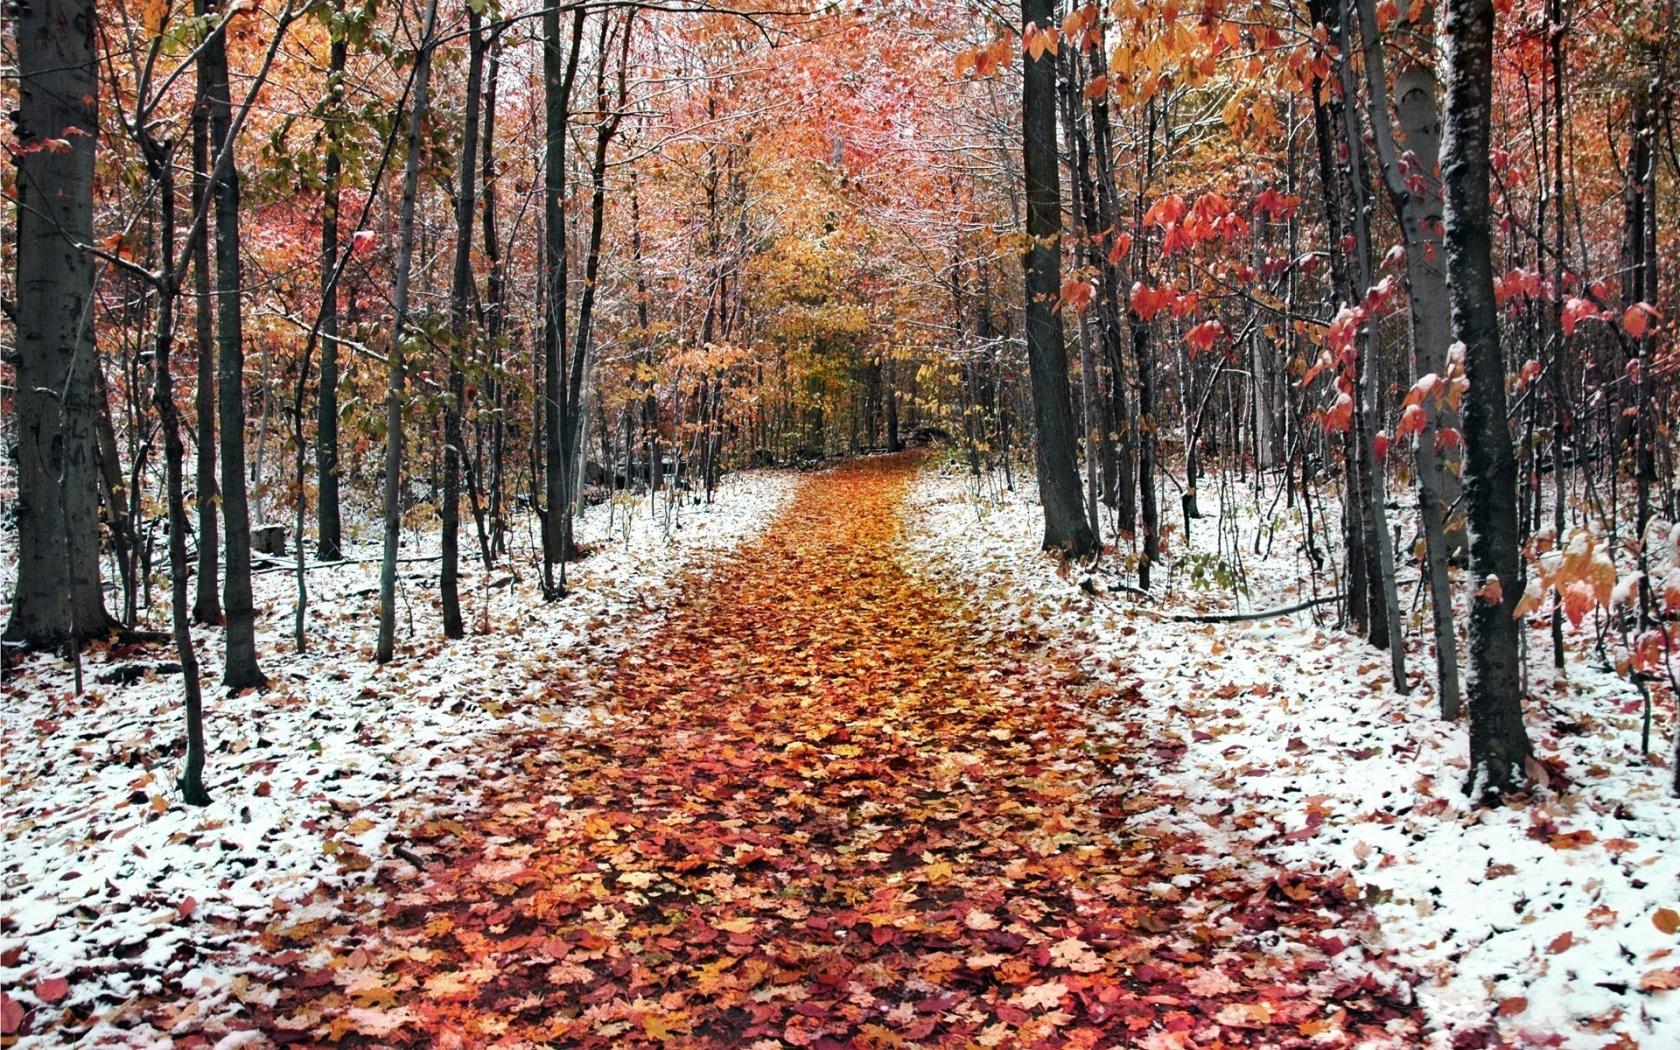 Late autumn the first snow fell Desktop wallpapers 1680x1050 1680x1050